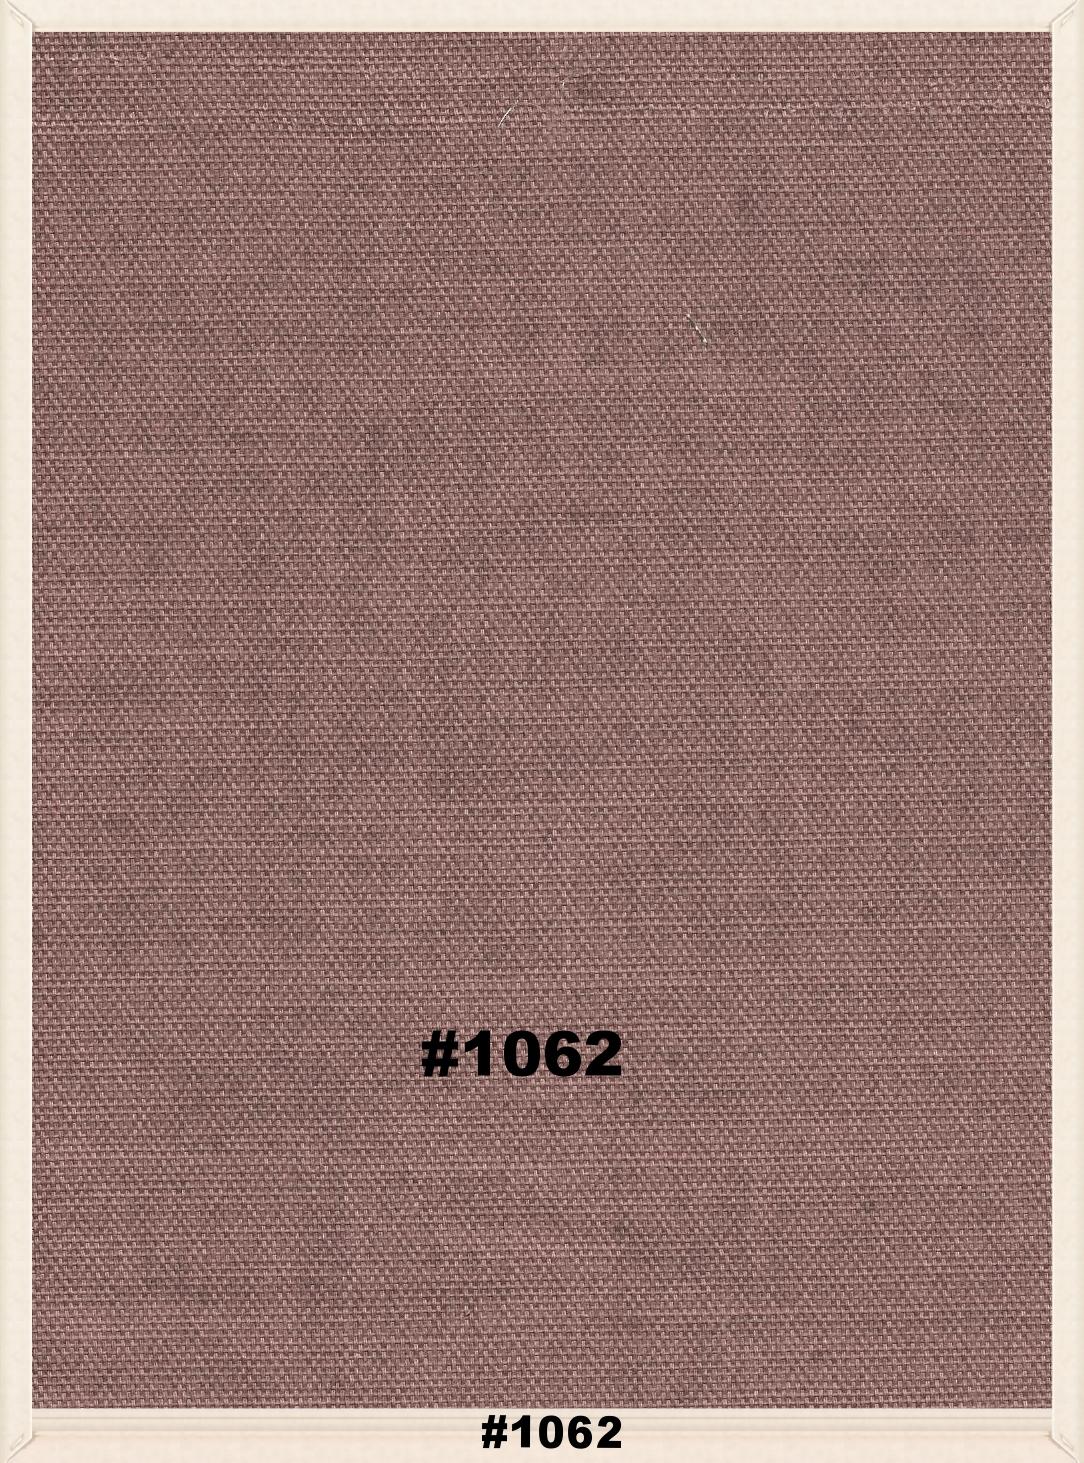 Indoor fabrics solid color